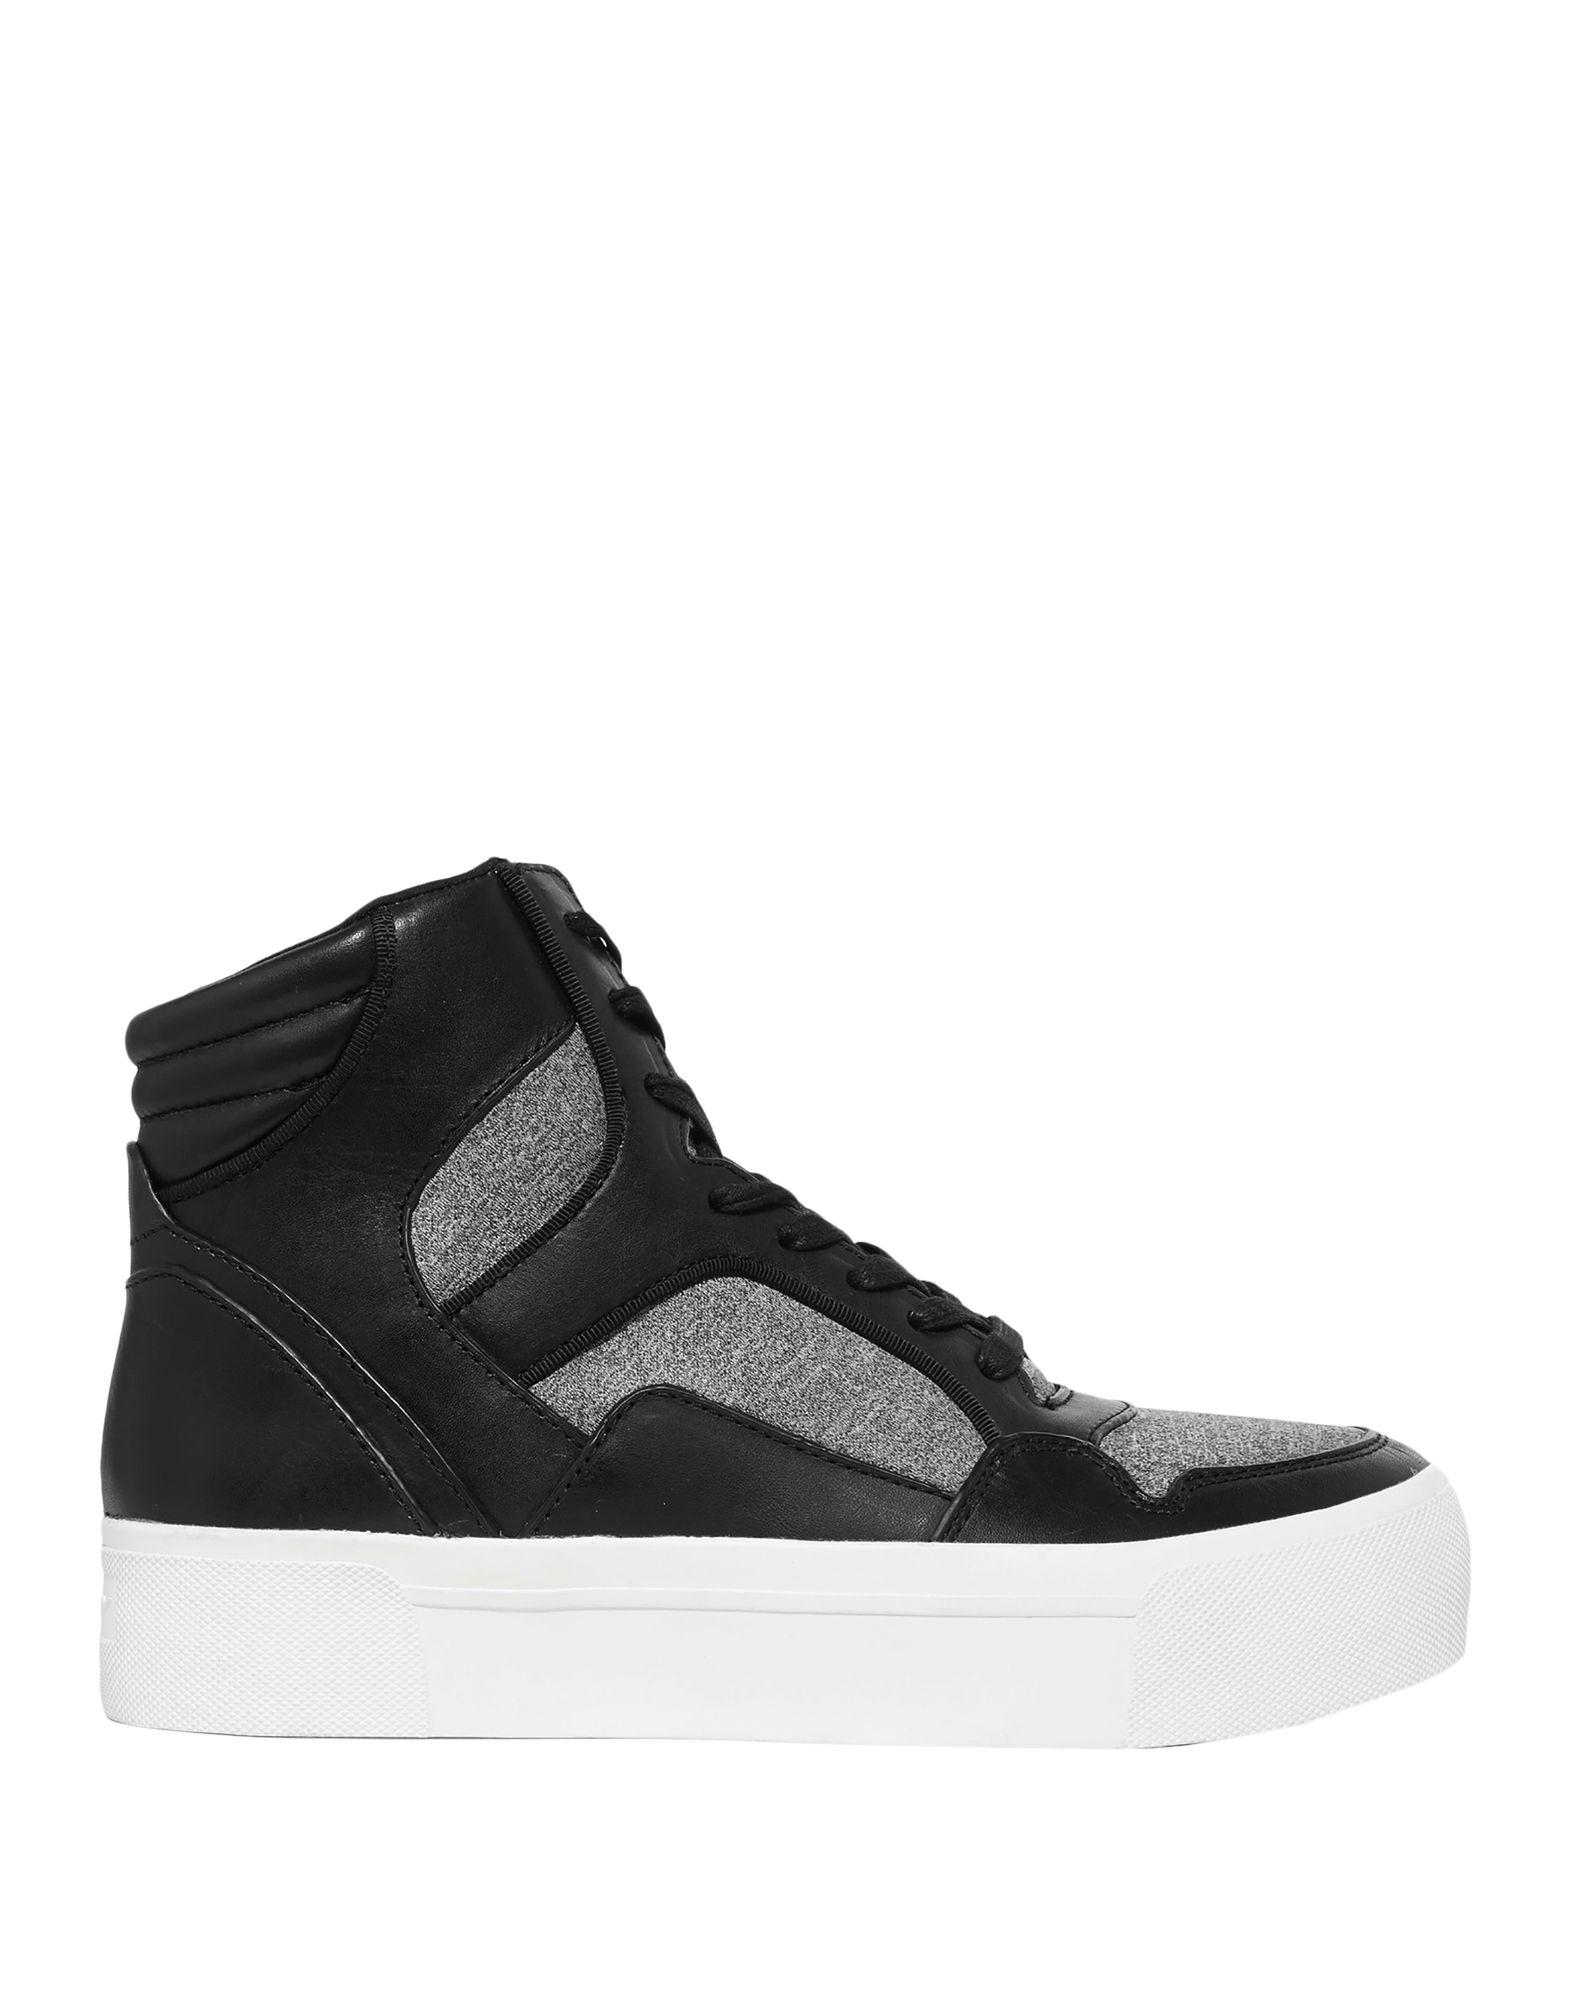 Dkny Sneakers Damen  strapazierfähige 11553832NXGut aussehende strapazierfähige  Schuhe 750f0f